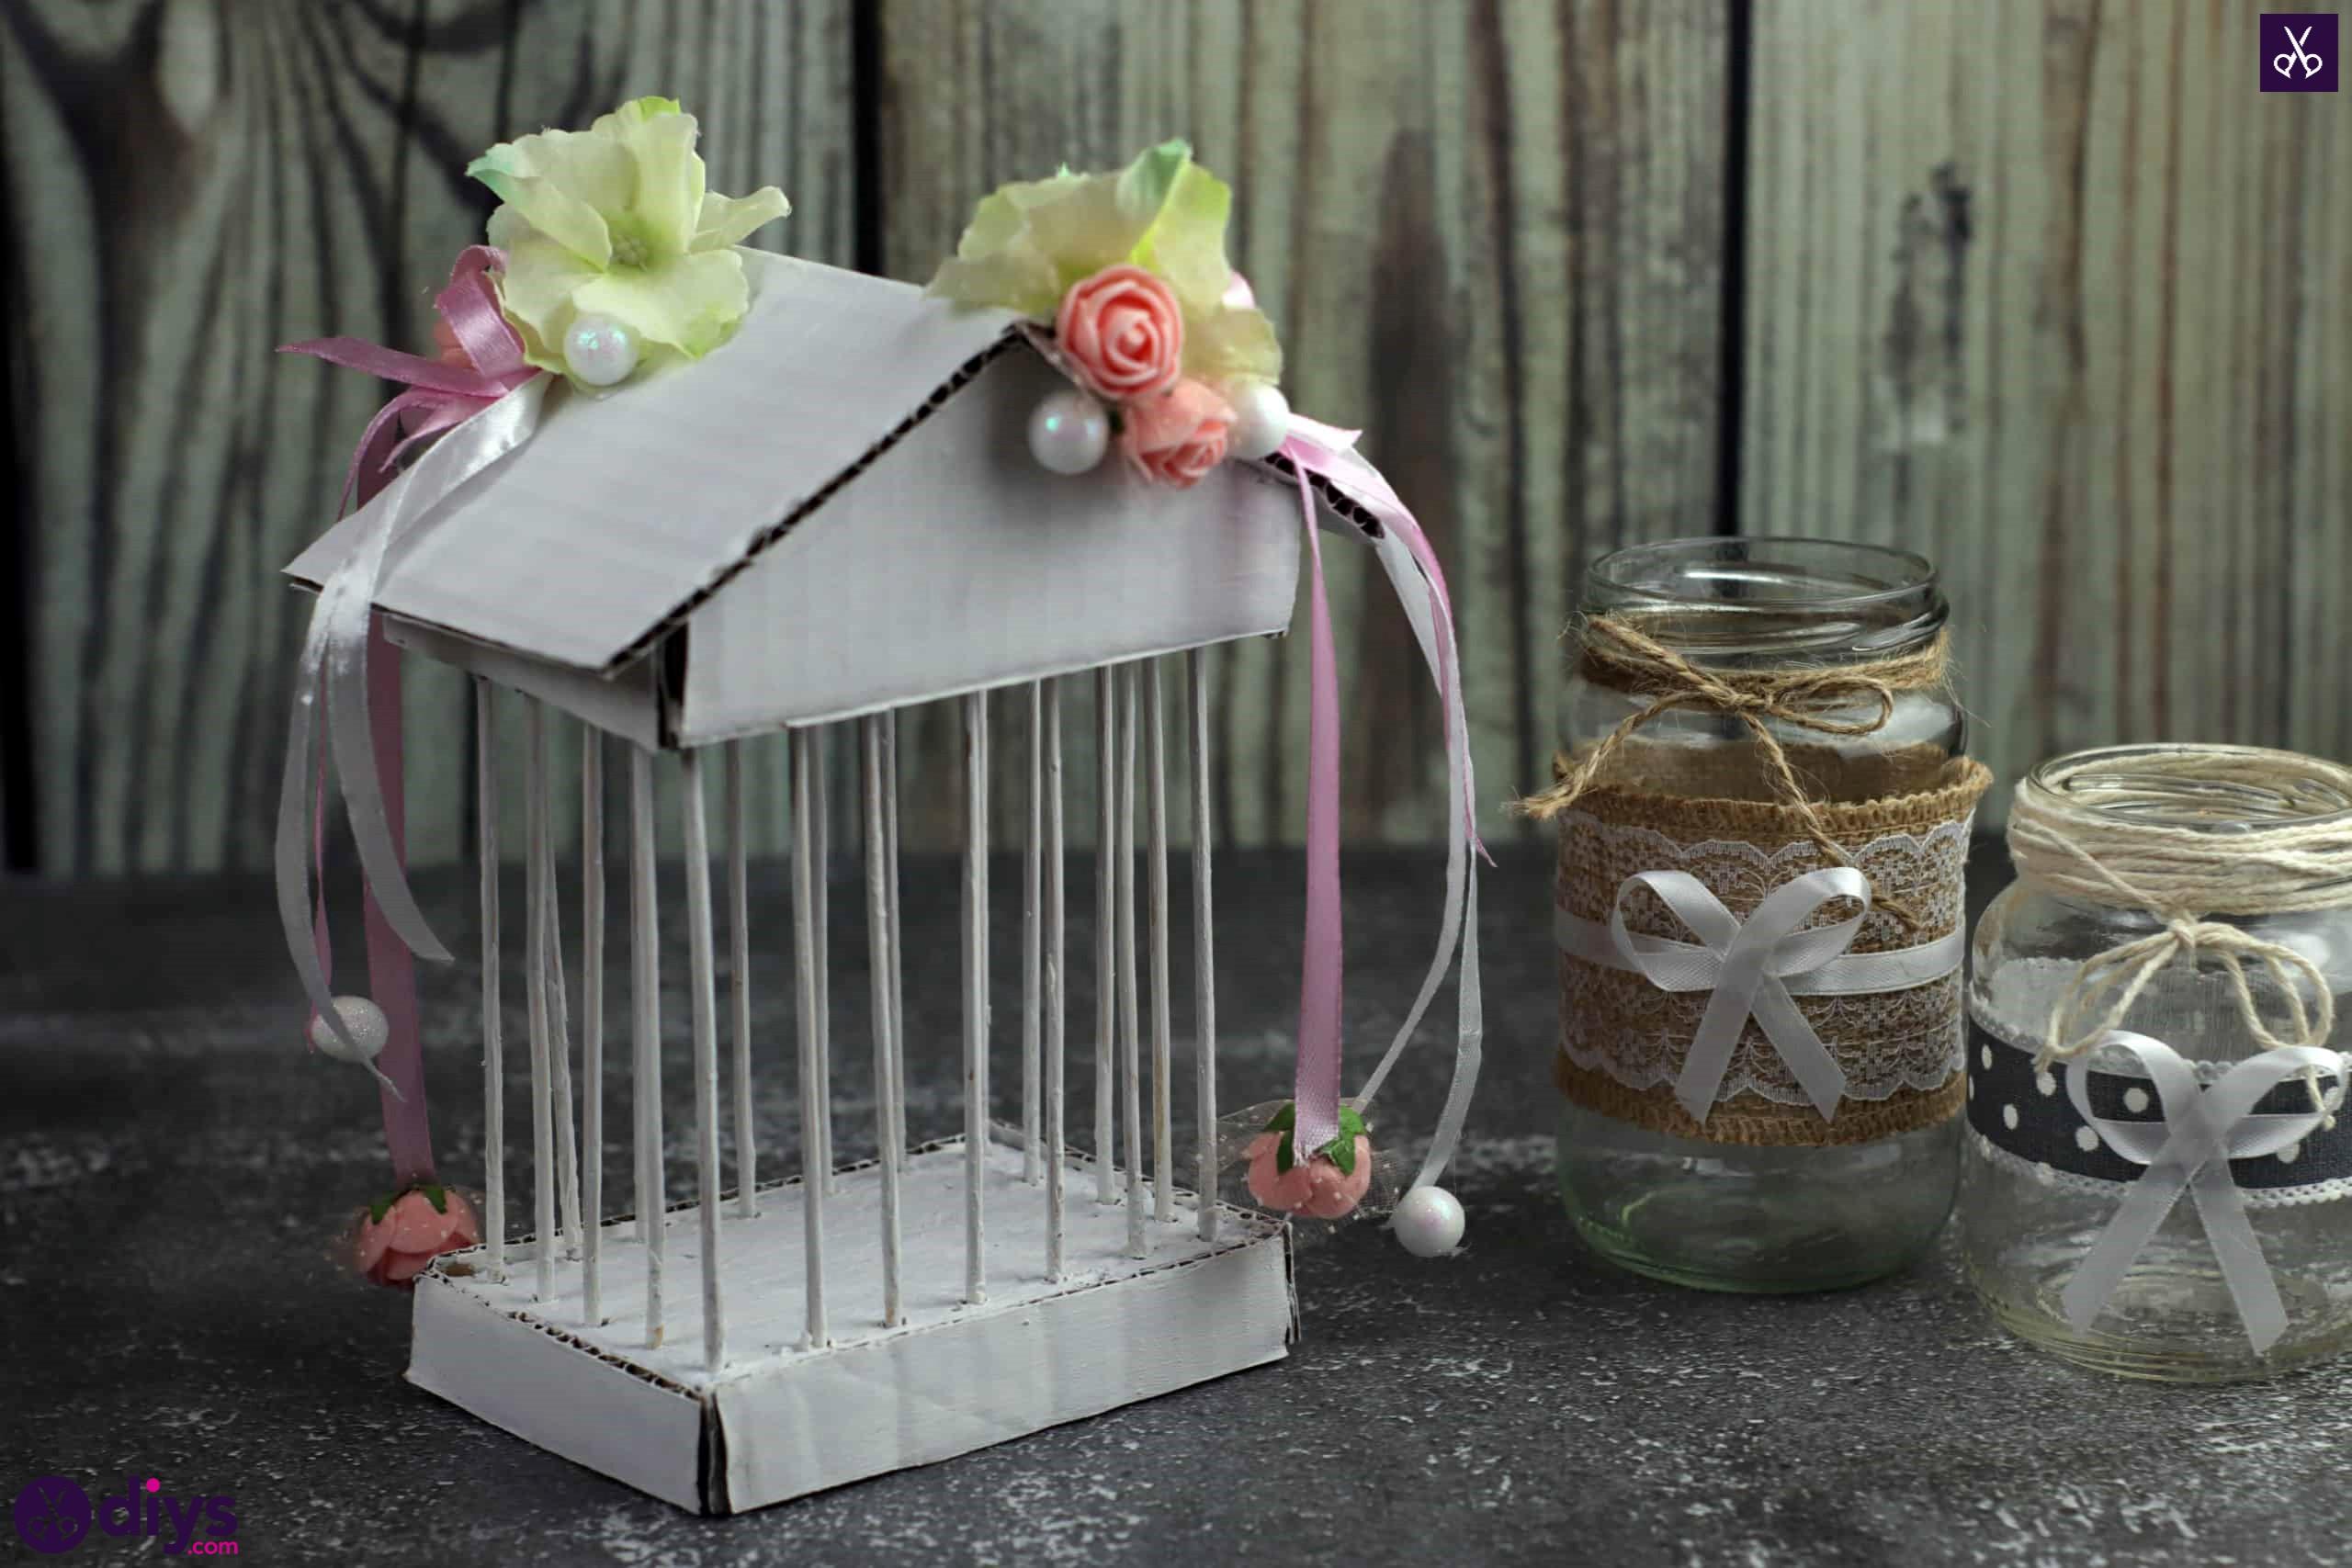 Diy miniature cage centerpiece display